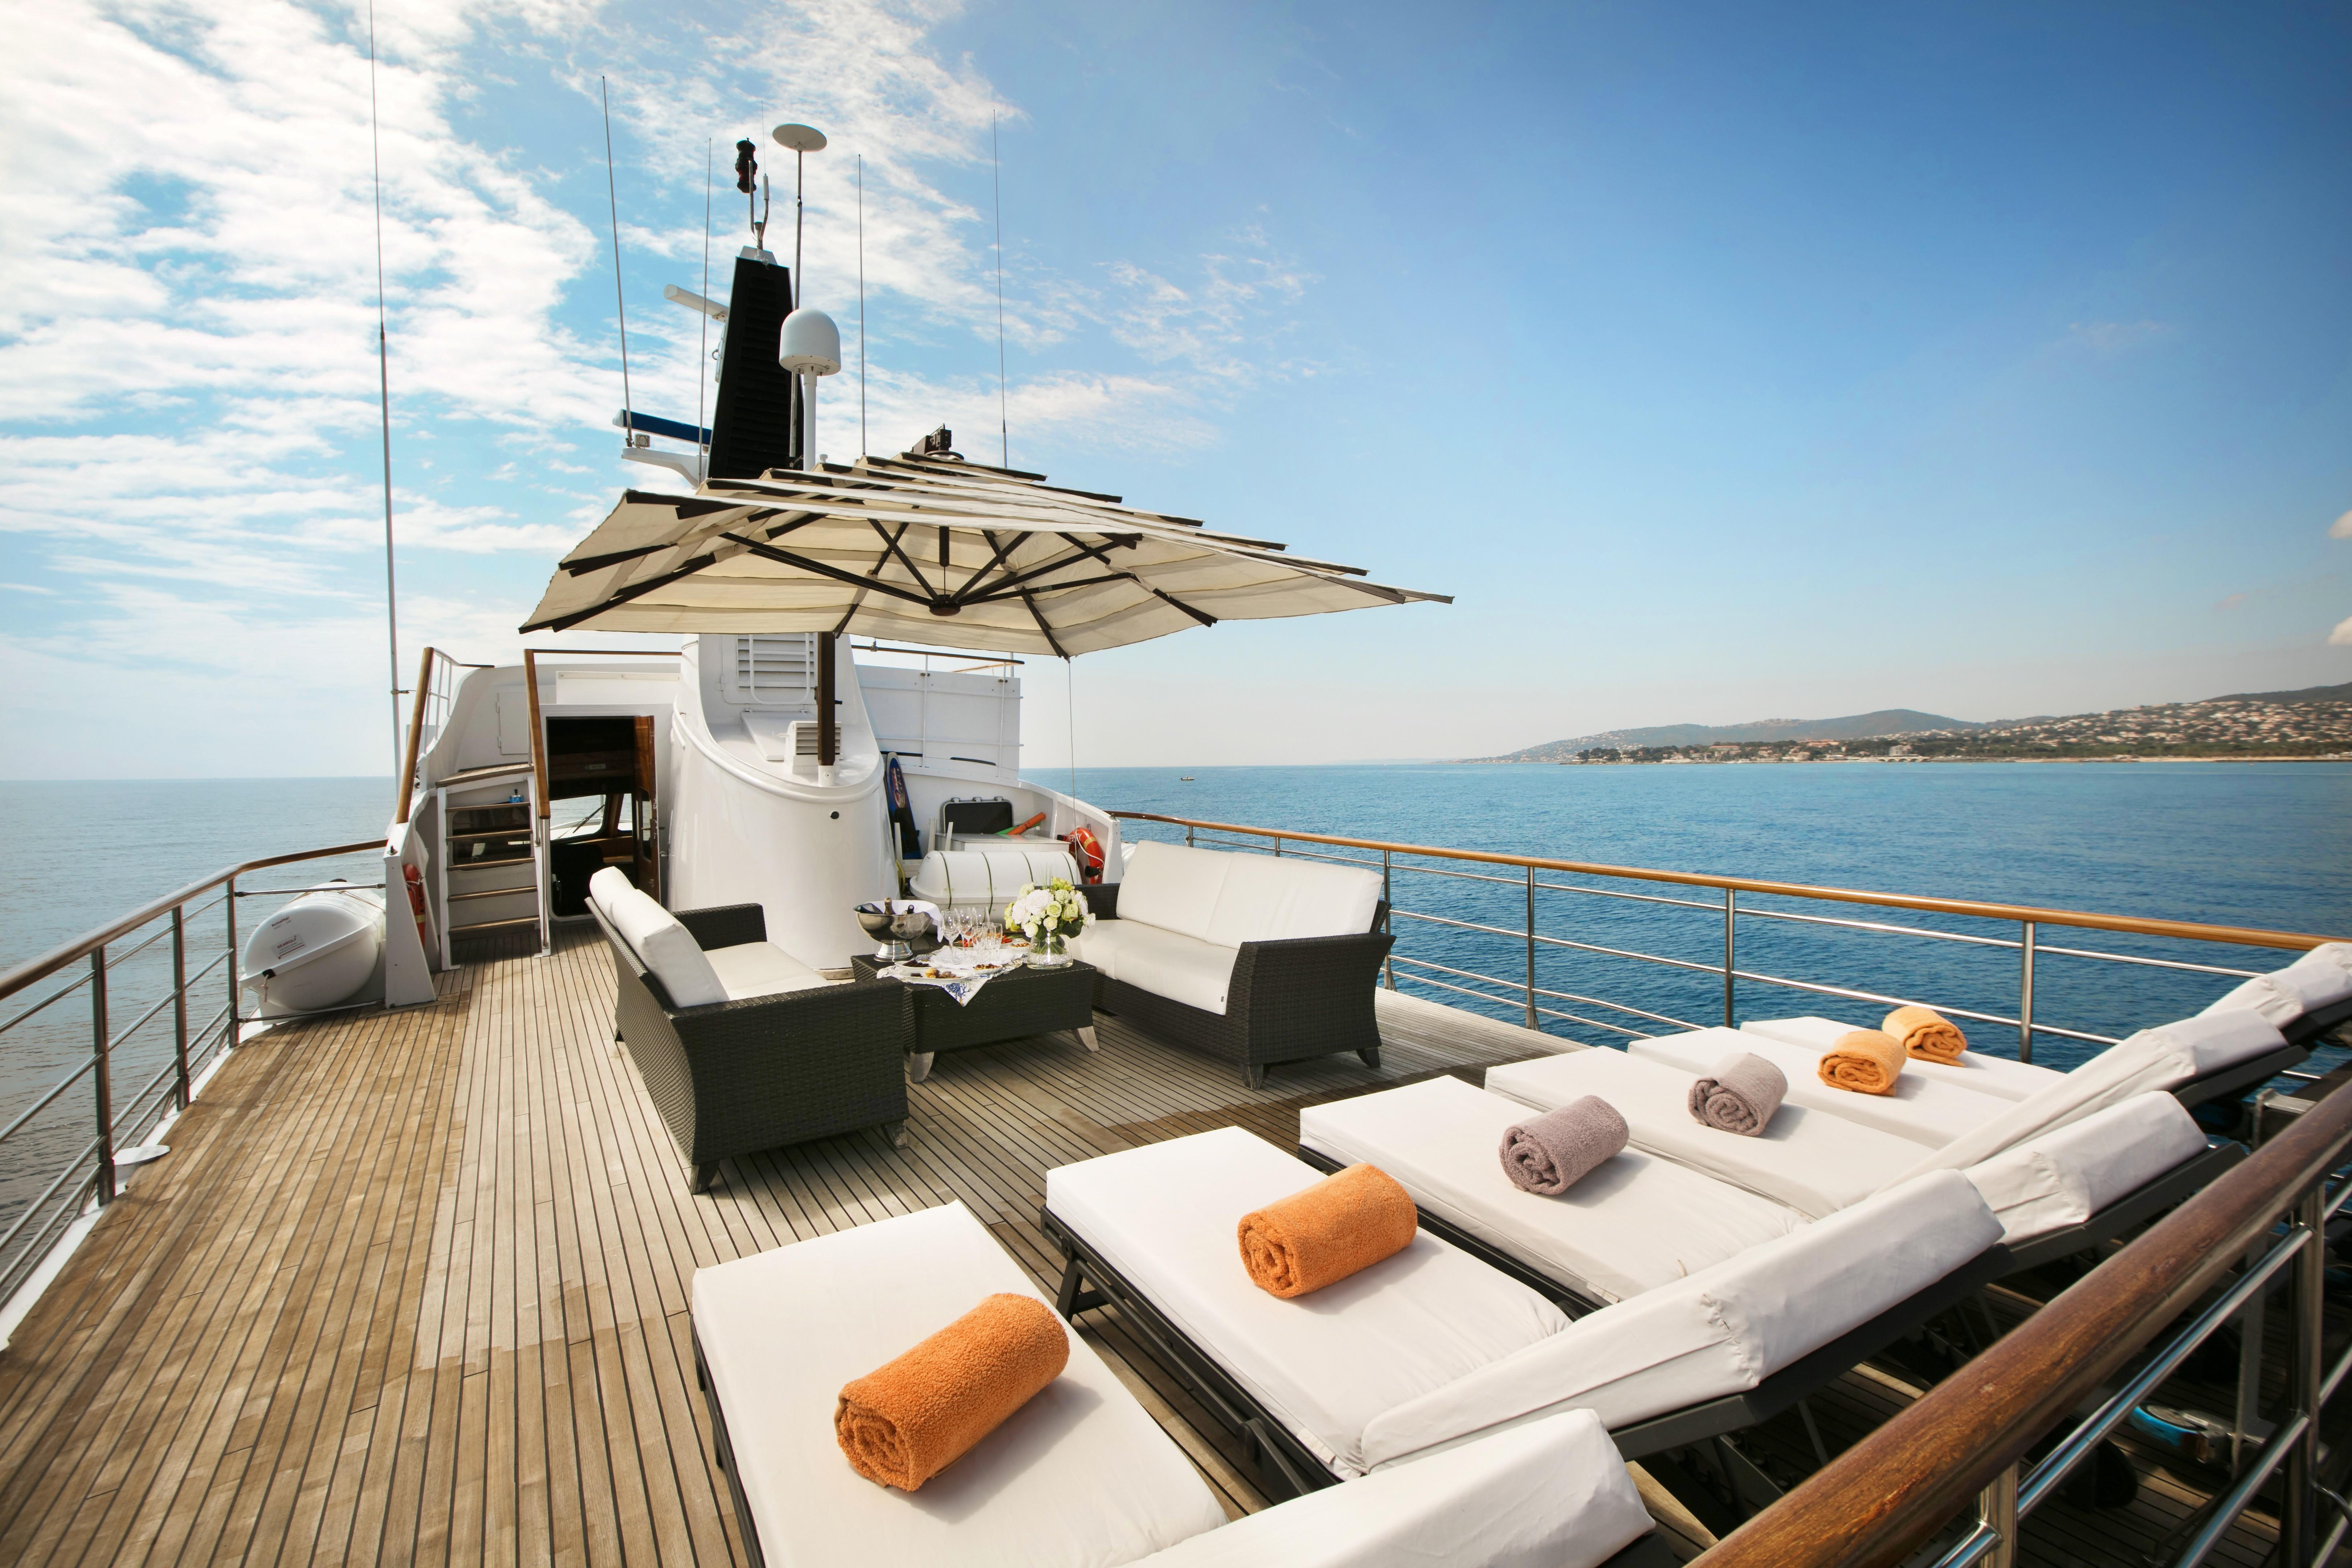 The 36m Yacht LADY JERSEY